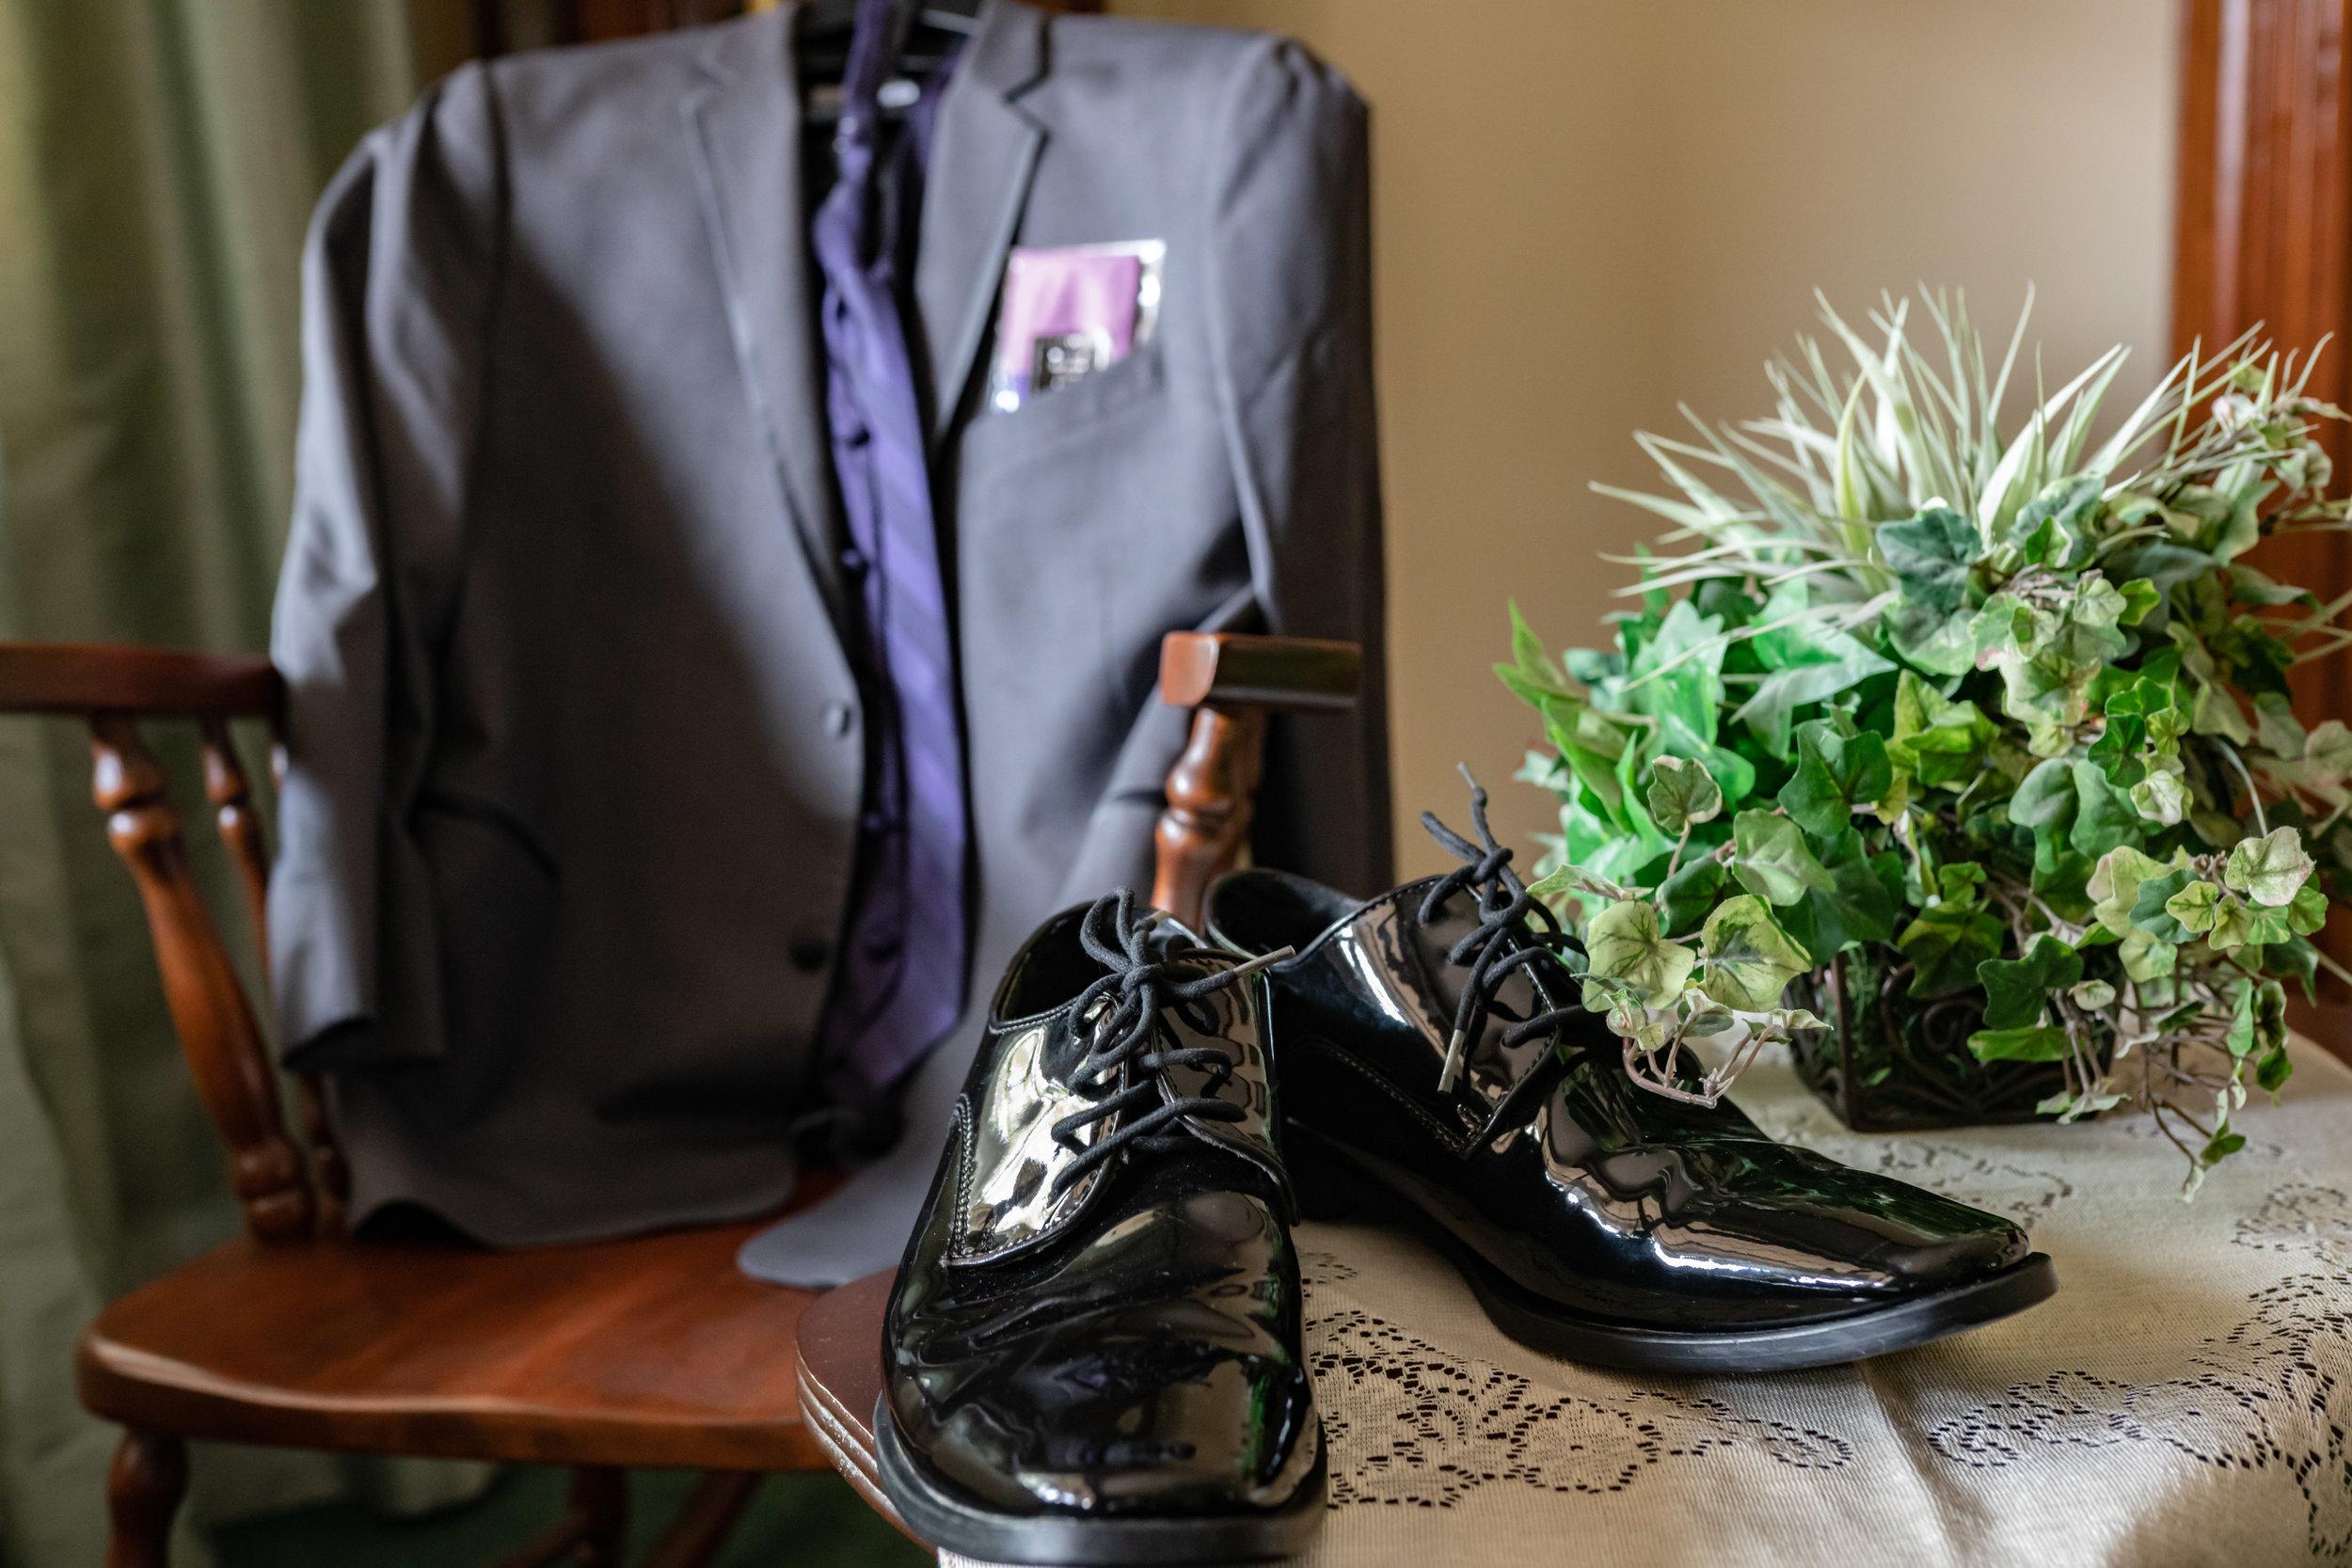 groom-wedding-attire-suit-tie-shoes-detail.jpg